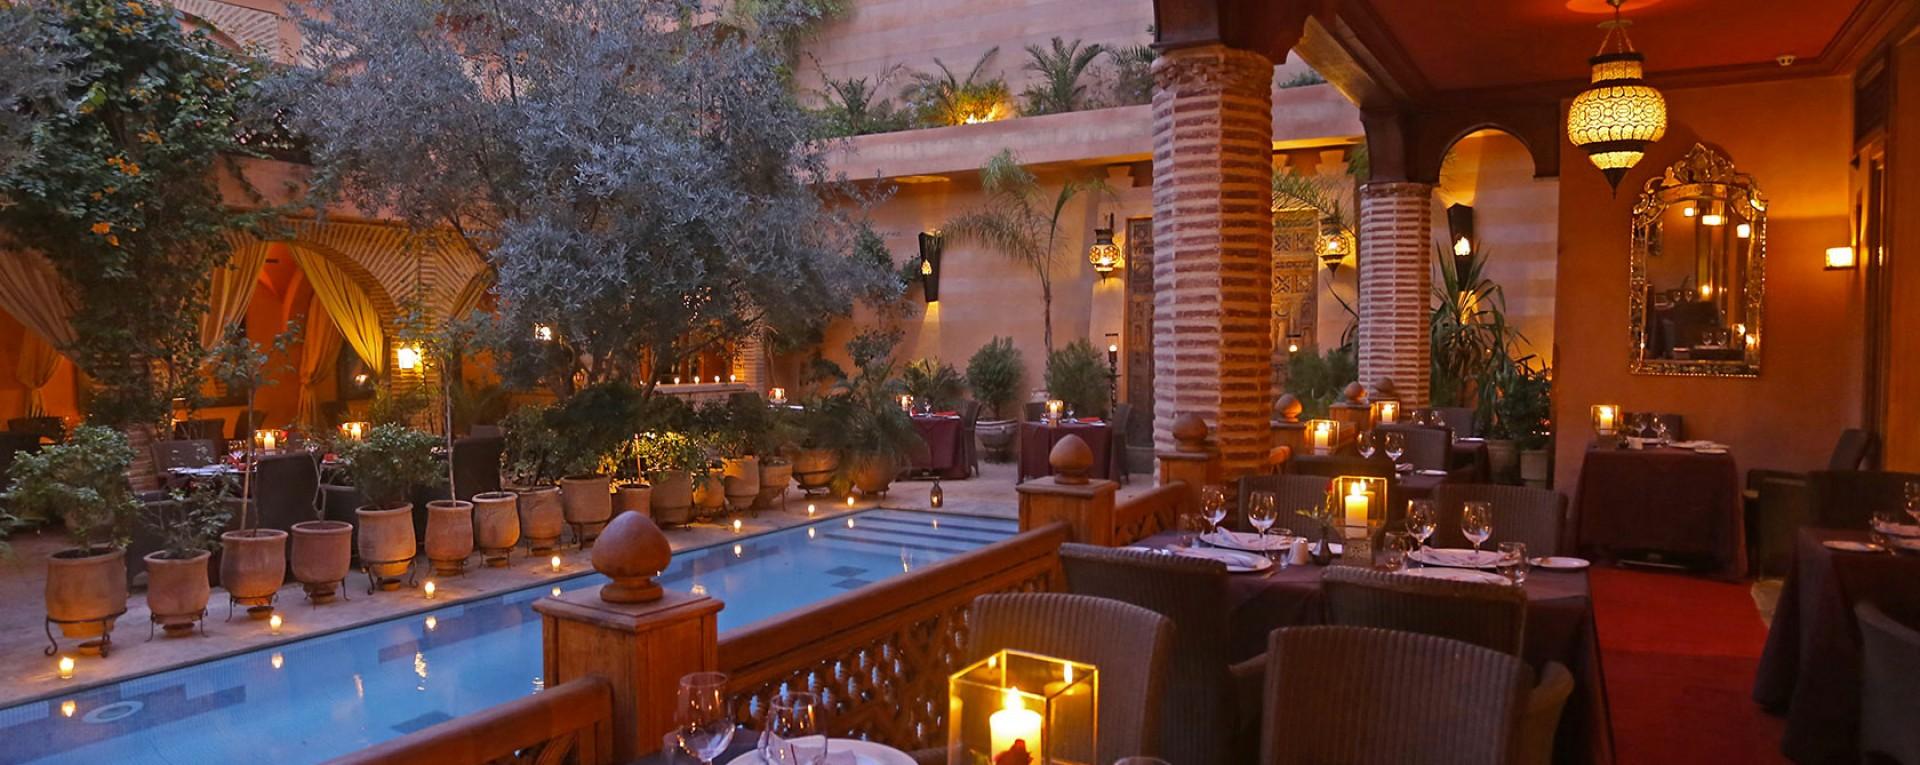 La maison arabe hotel marrakech morocco further afield for Jardin restaurant madison